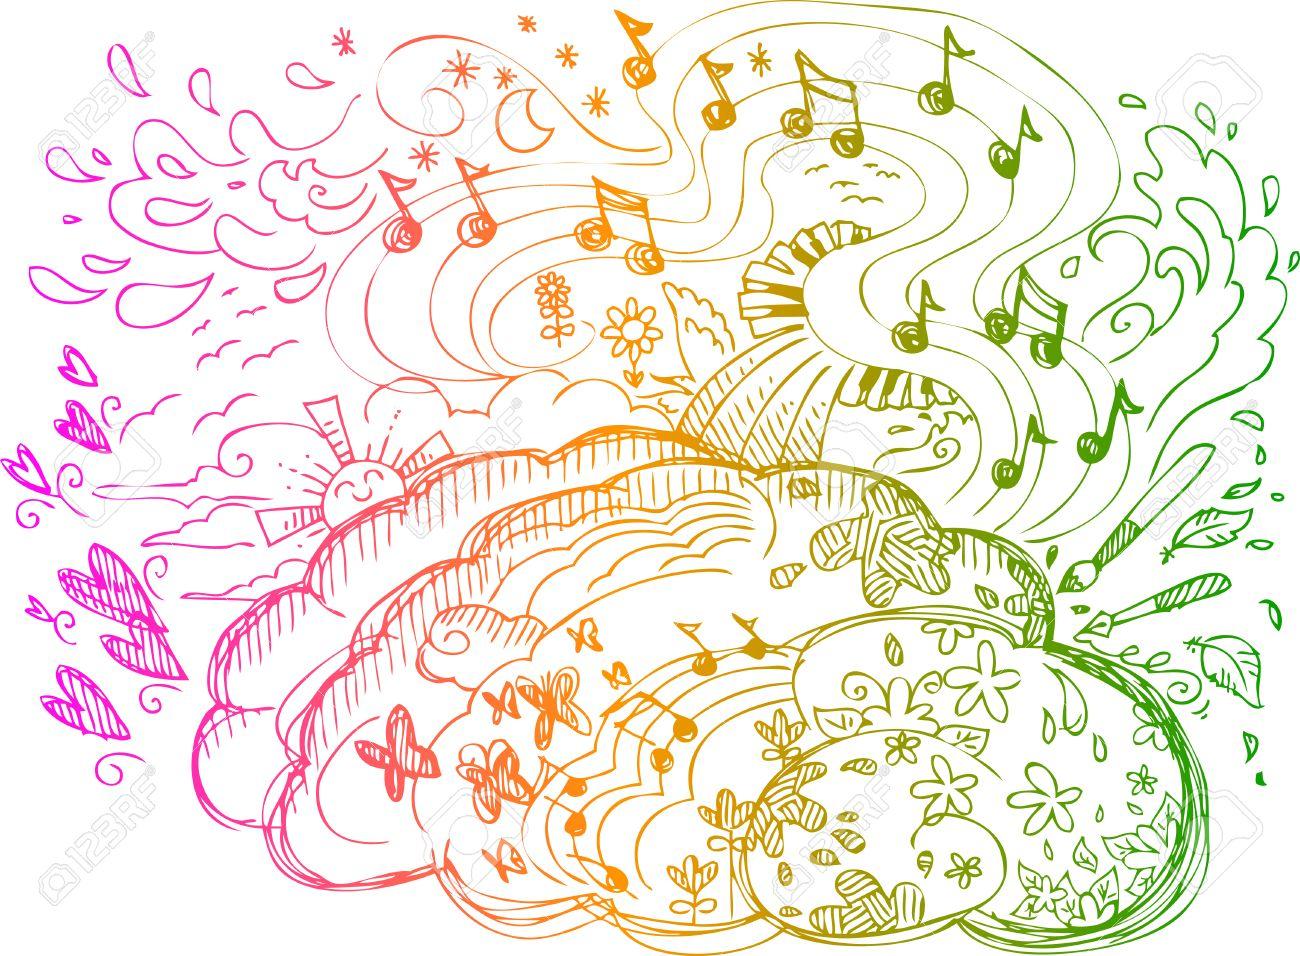 Right Brain hemisphere emotions, spiritual life, intuitions, music, creativity - 22280049